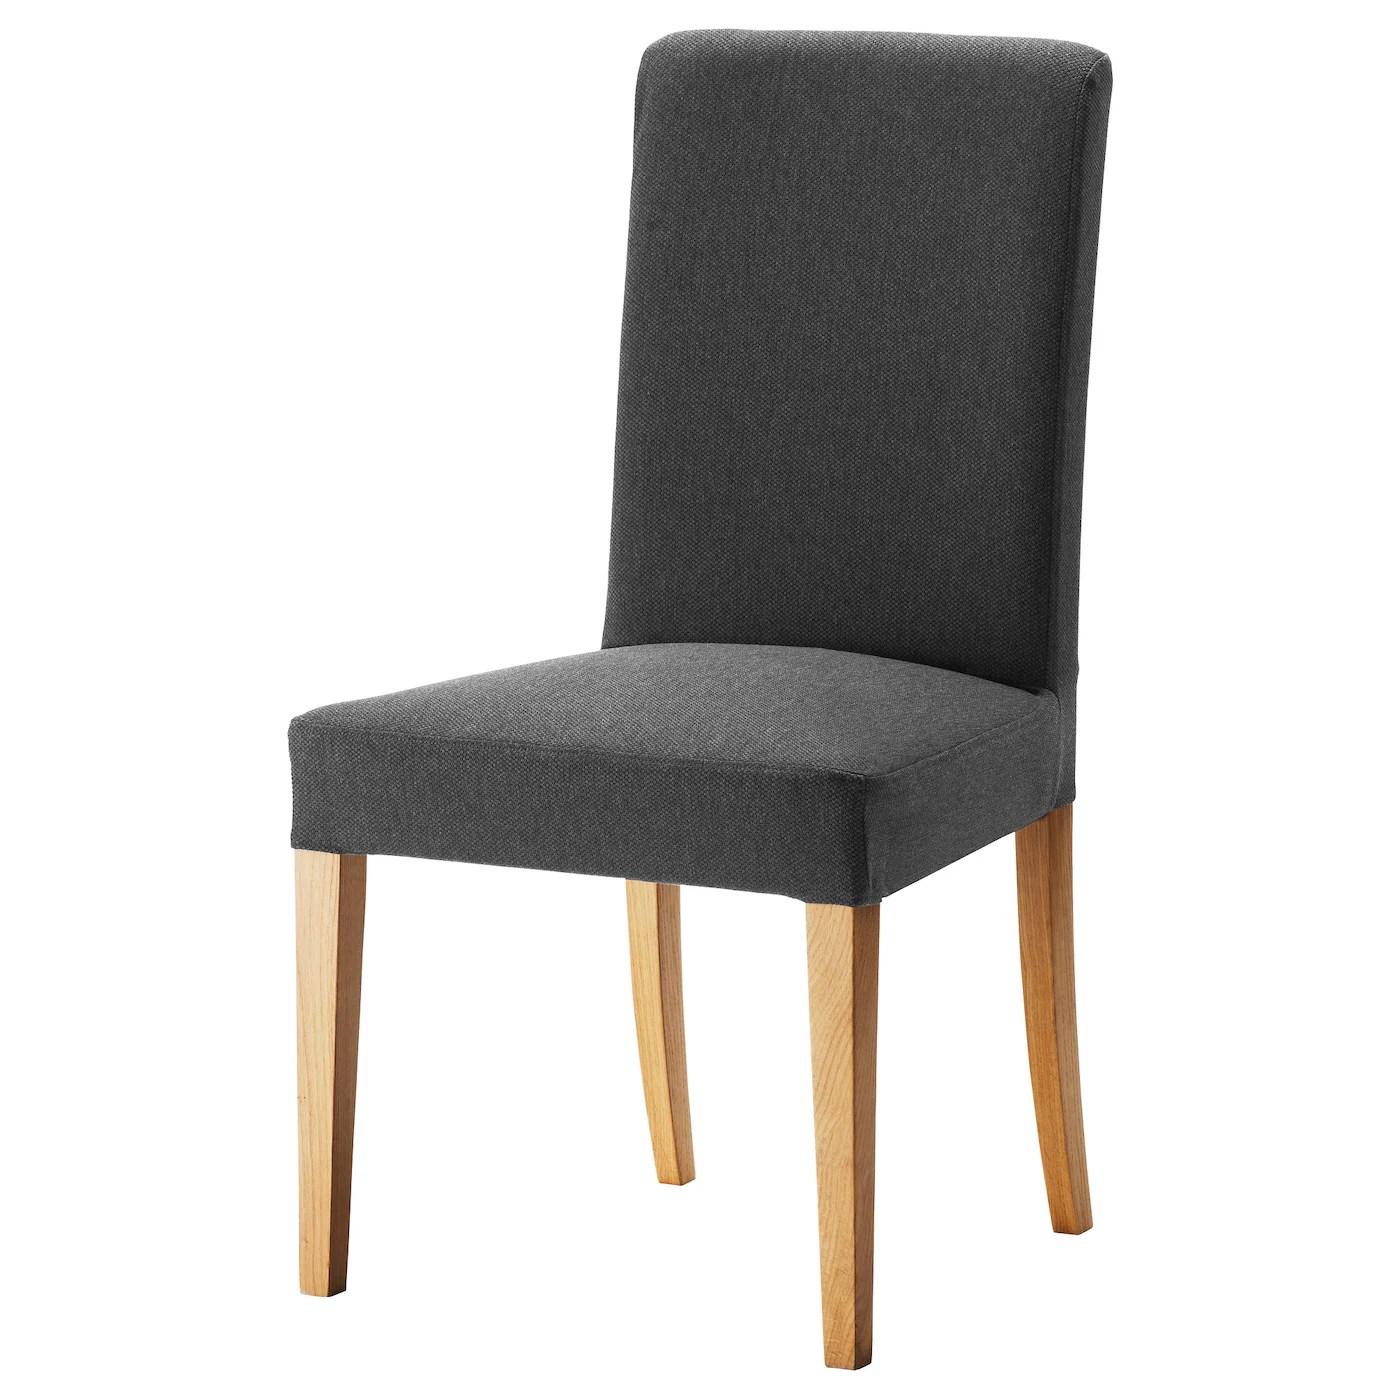 Henriksdal Chair Dansbo Dark Grey Width 51 Cm Ikea Ireland